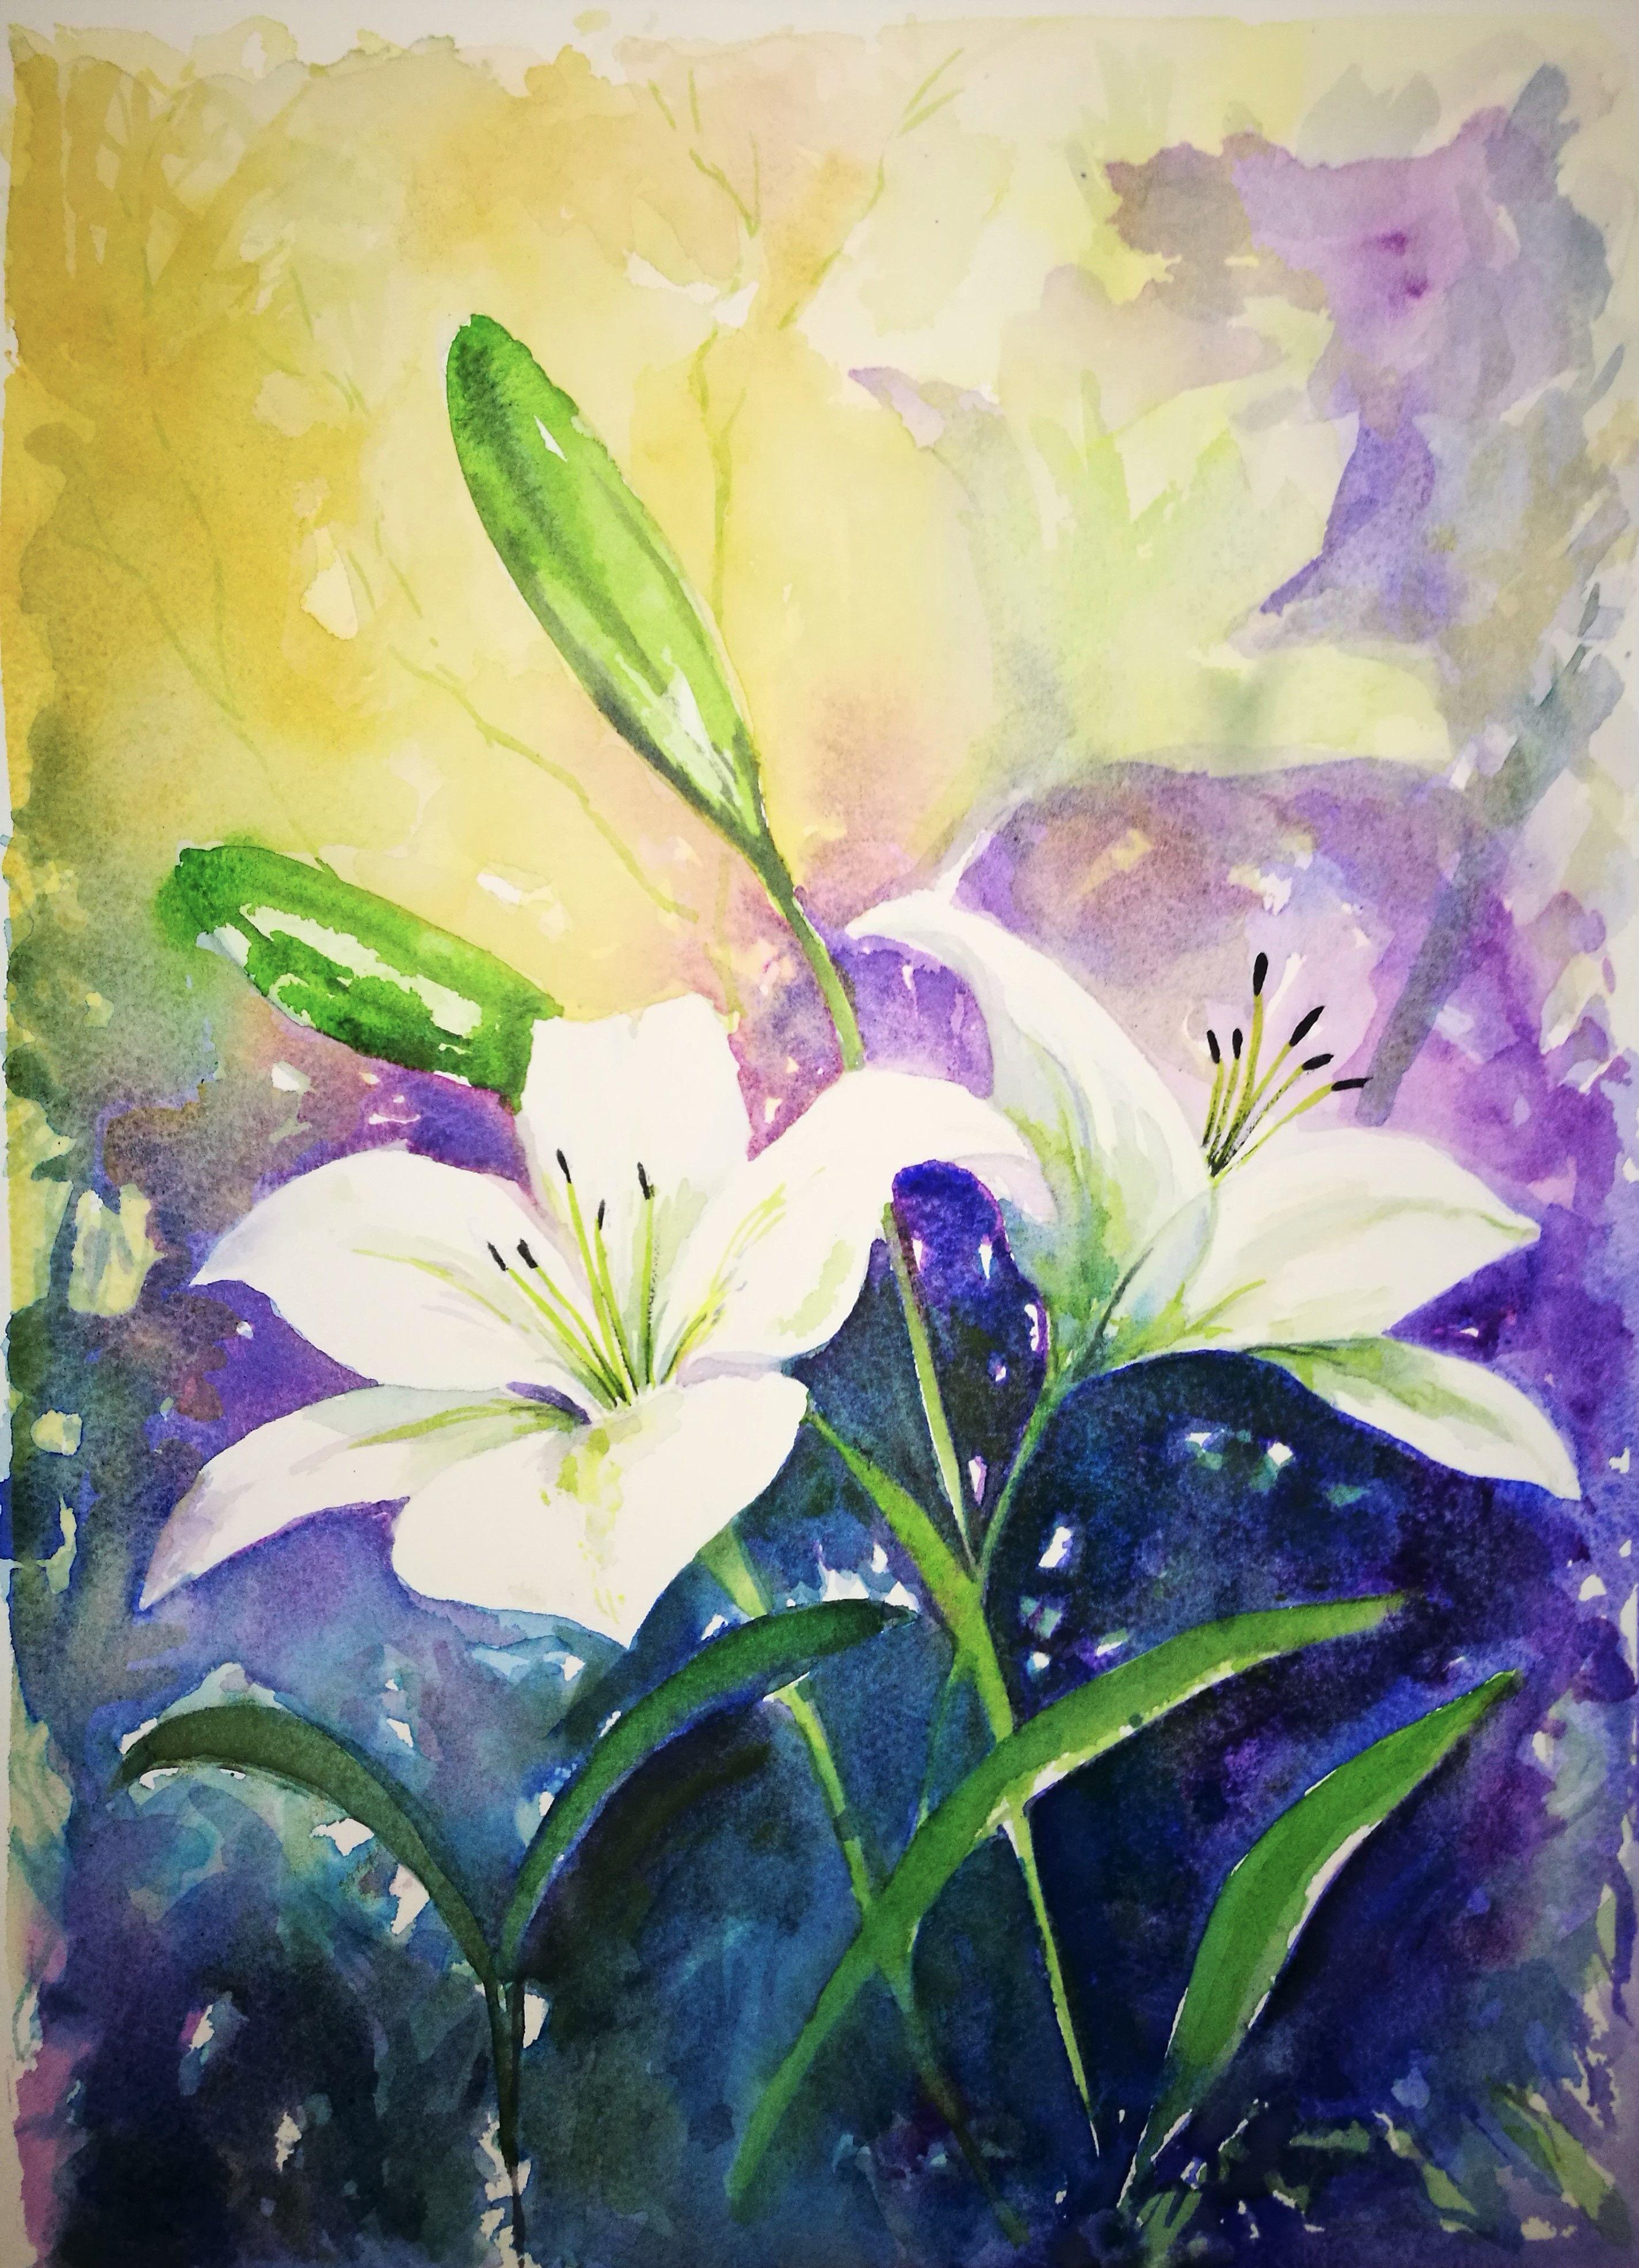 More Lillies In My Garden Art Beautiful Artwork Online Art Gallery